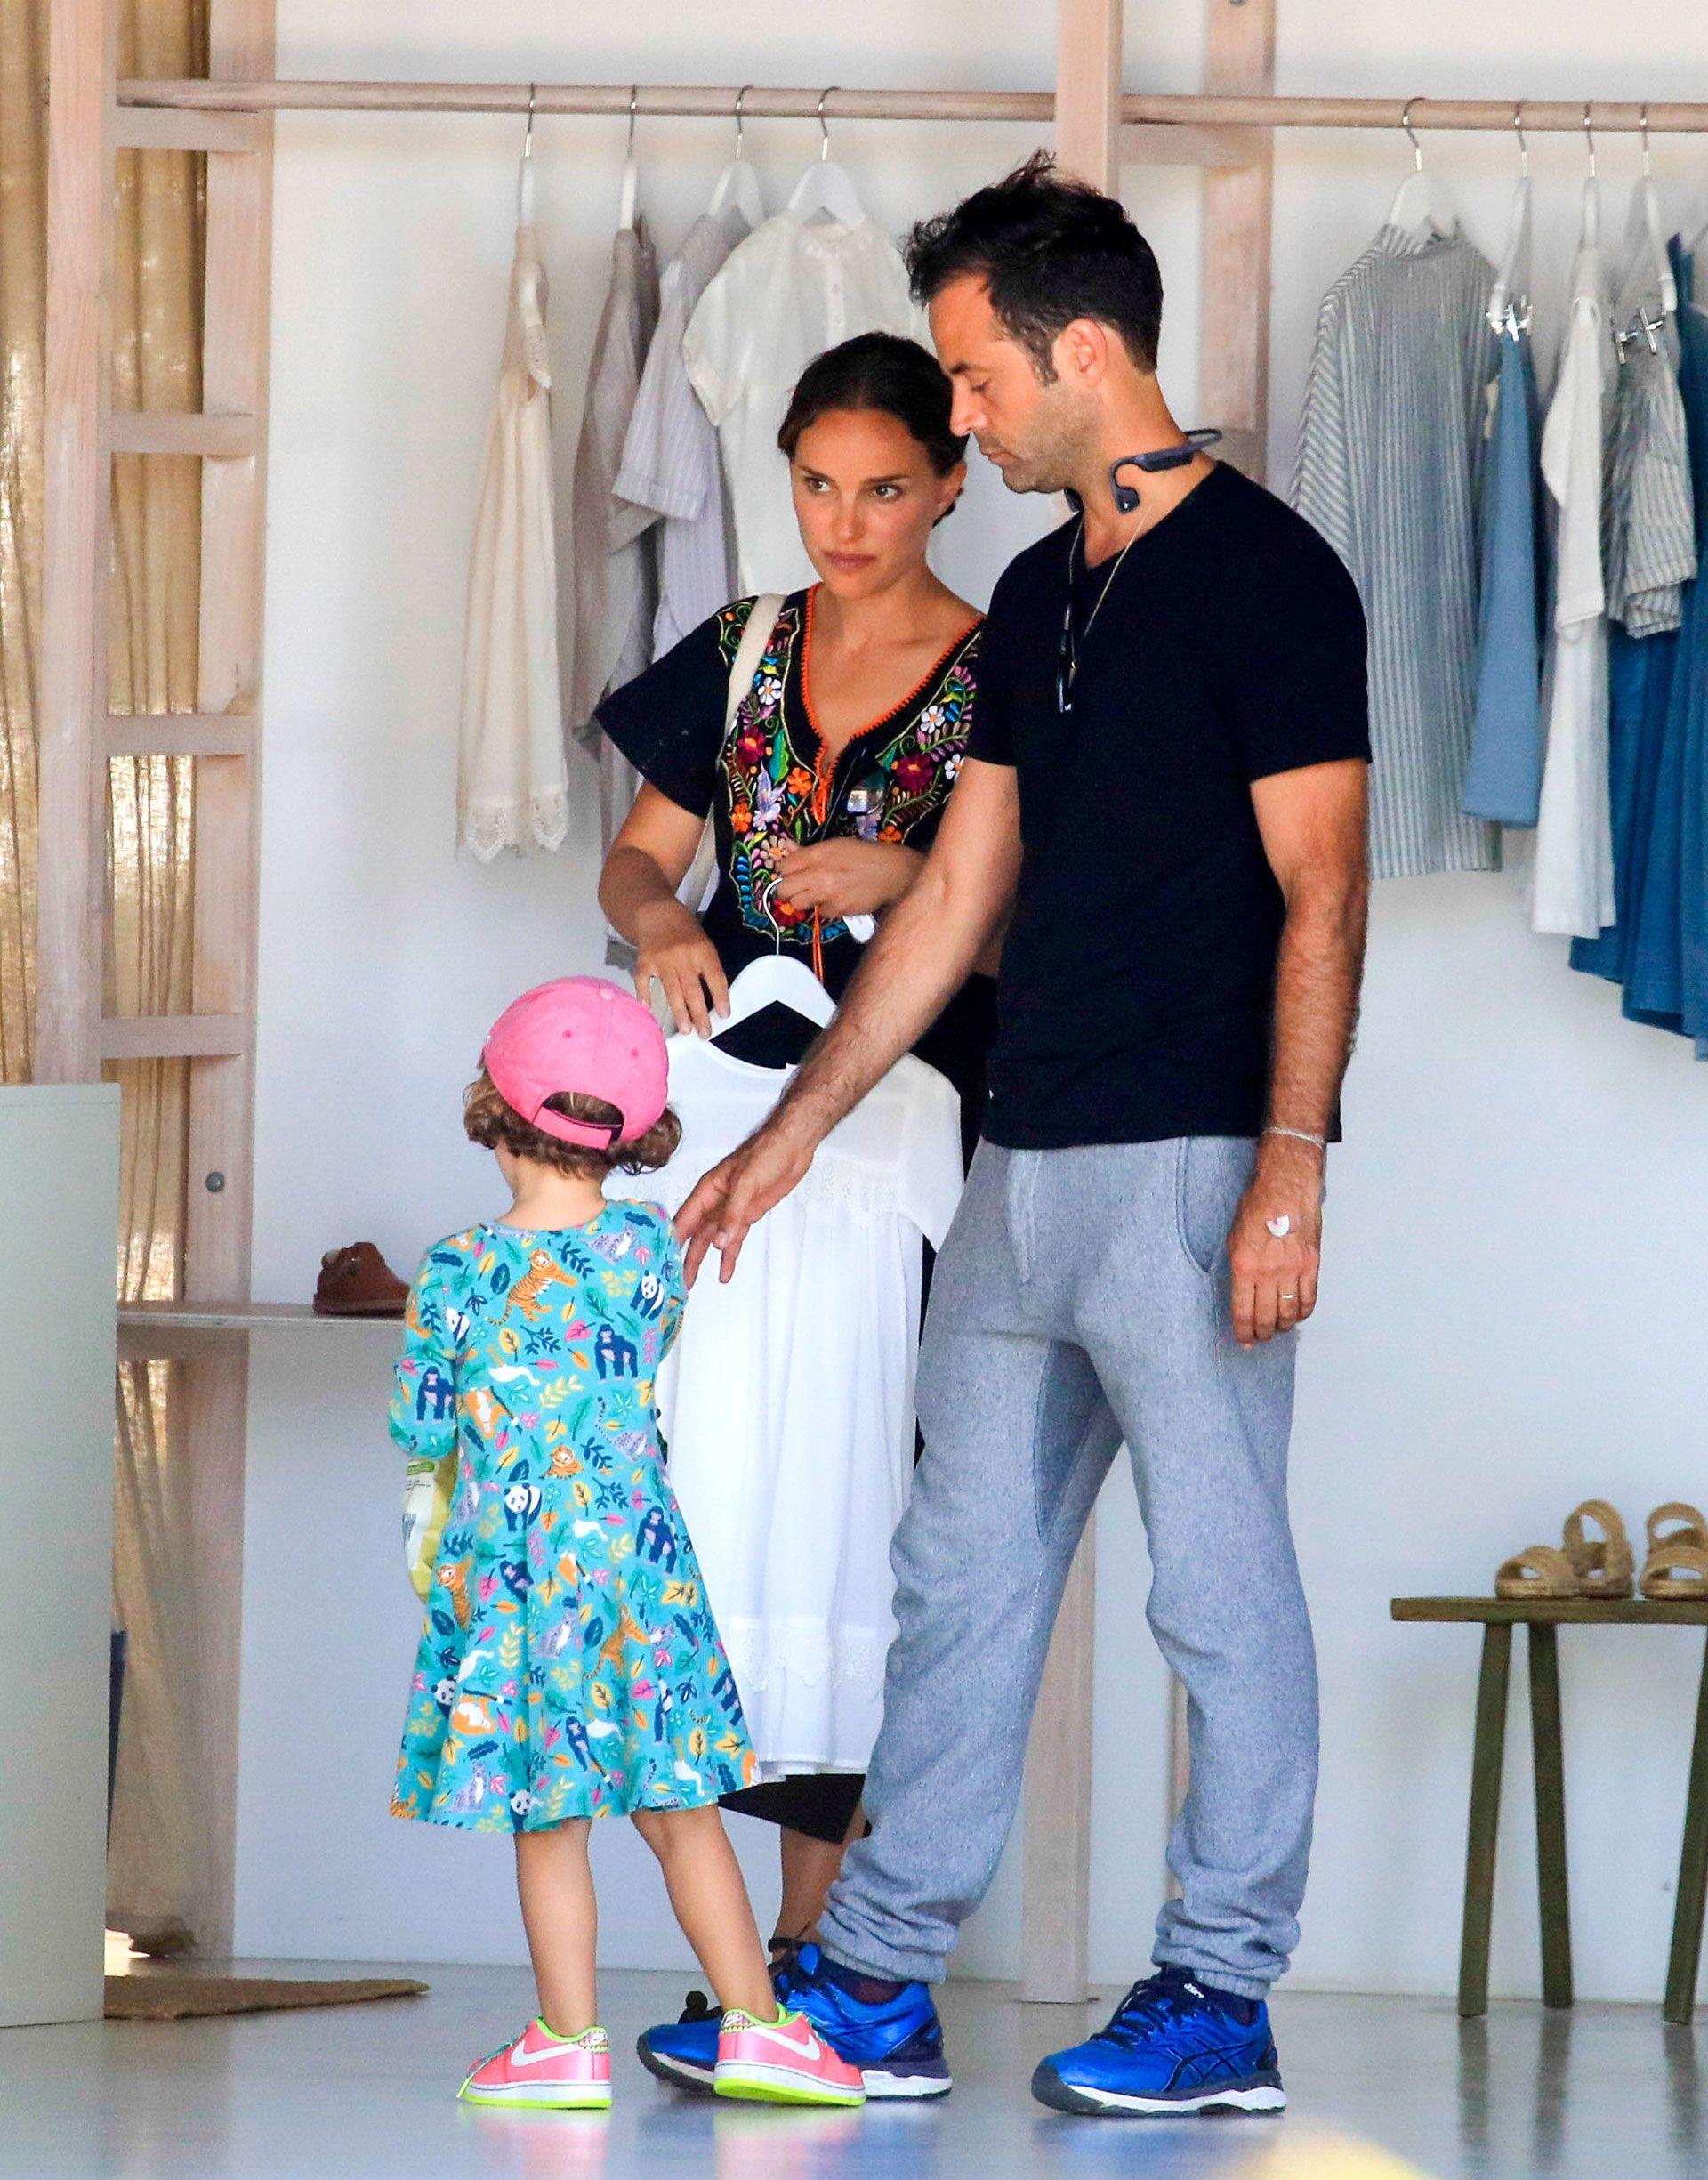 Celebrities-en-un-clic-Natalie-Portman-08102020